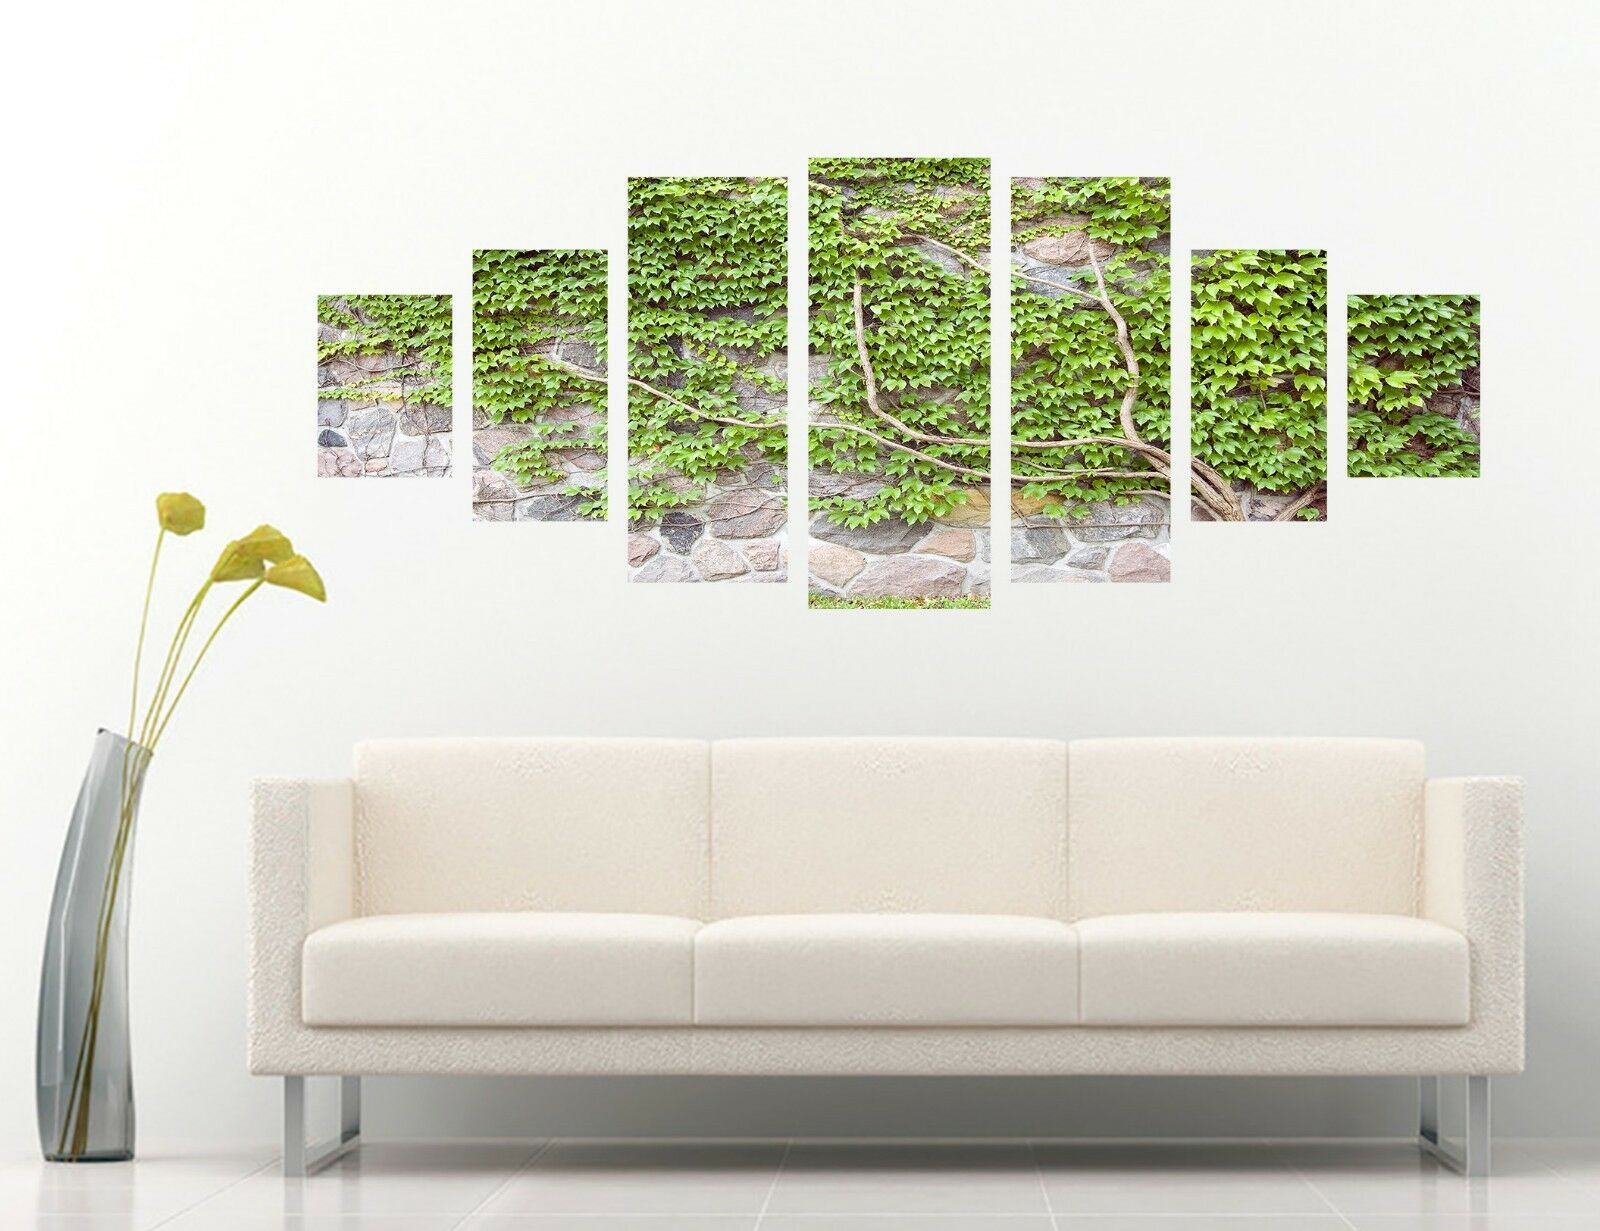 3D Green Leaf Wall 55 Unframed Print Wall Paper Decal Wall Deco Indoor AJ Wall